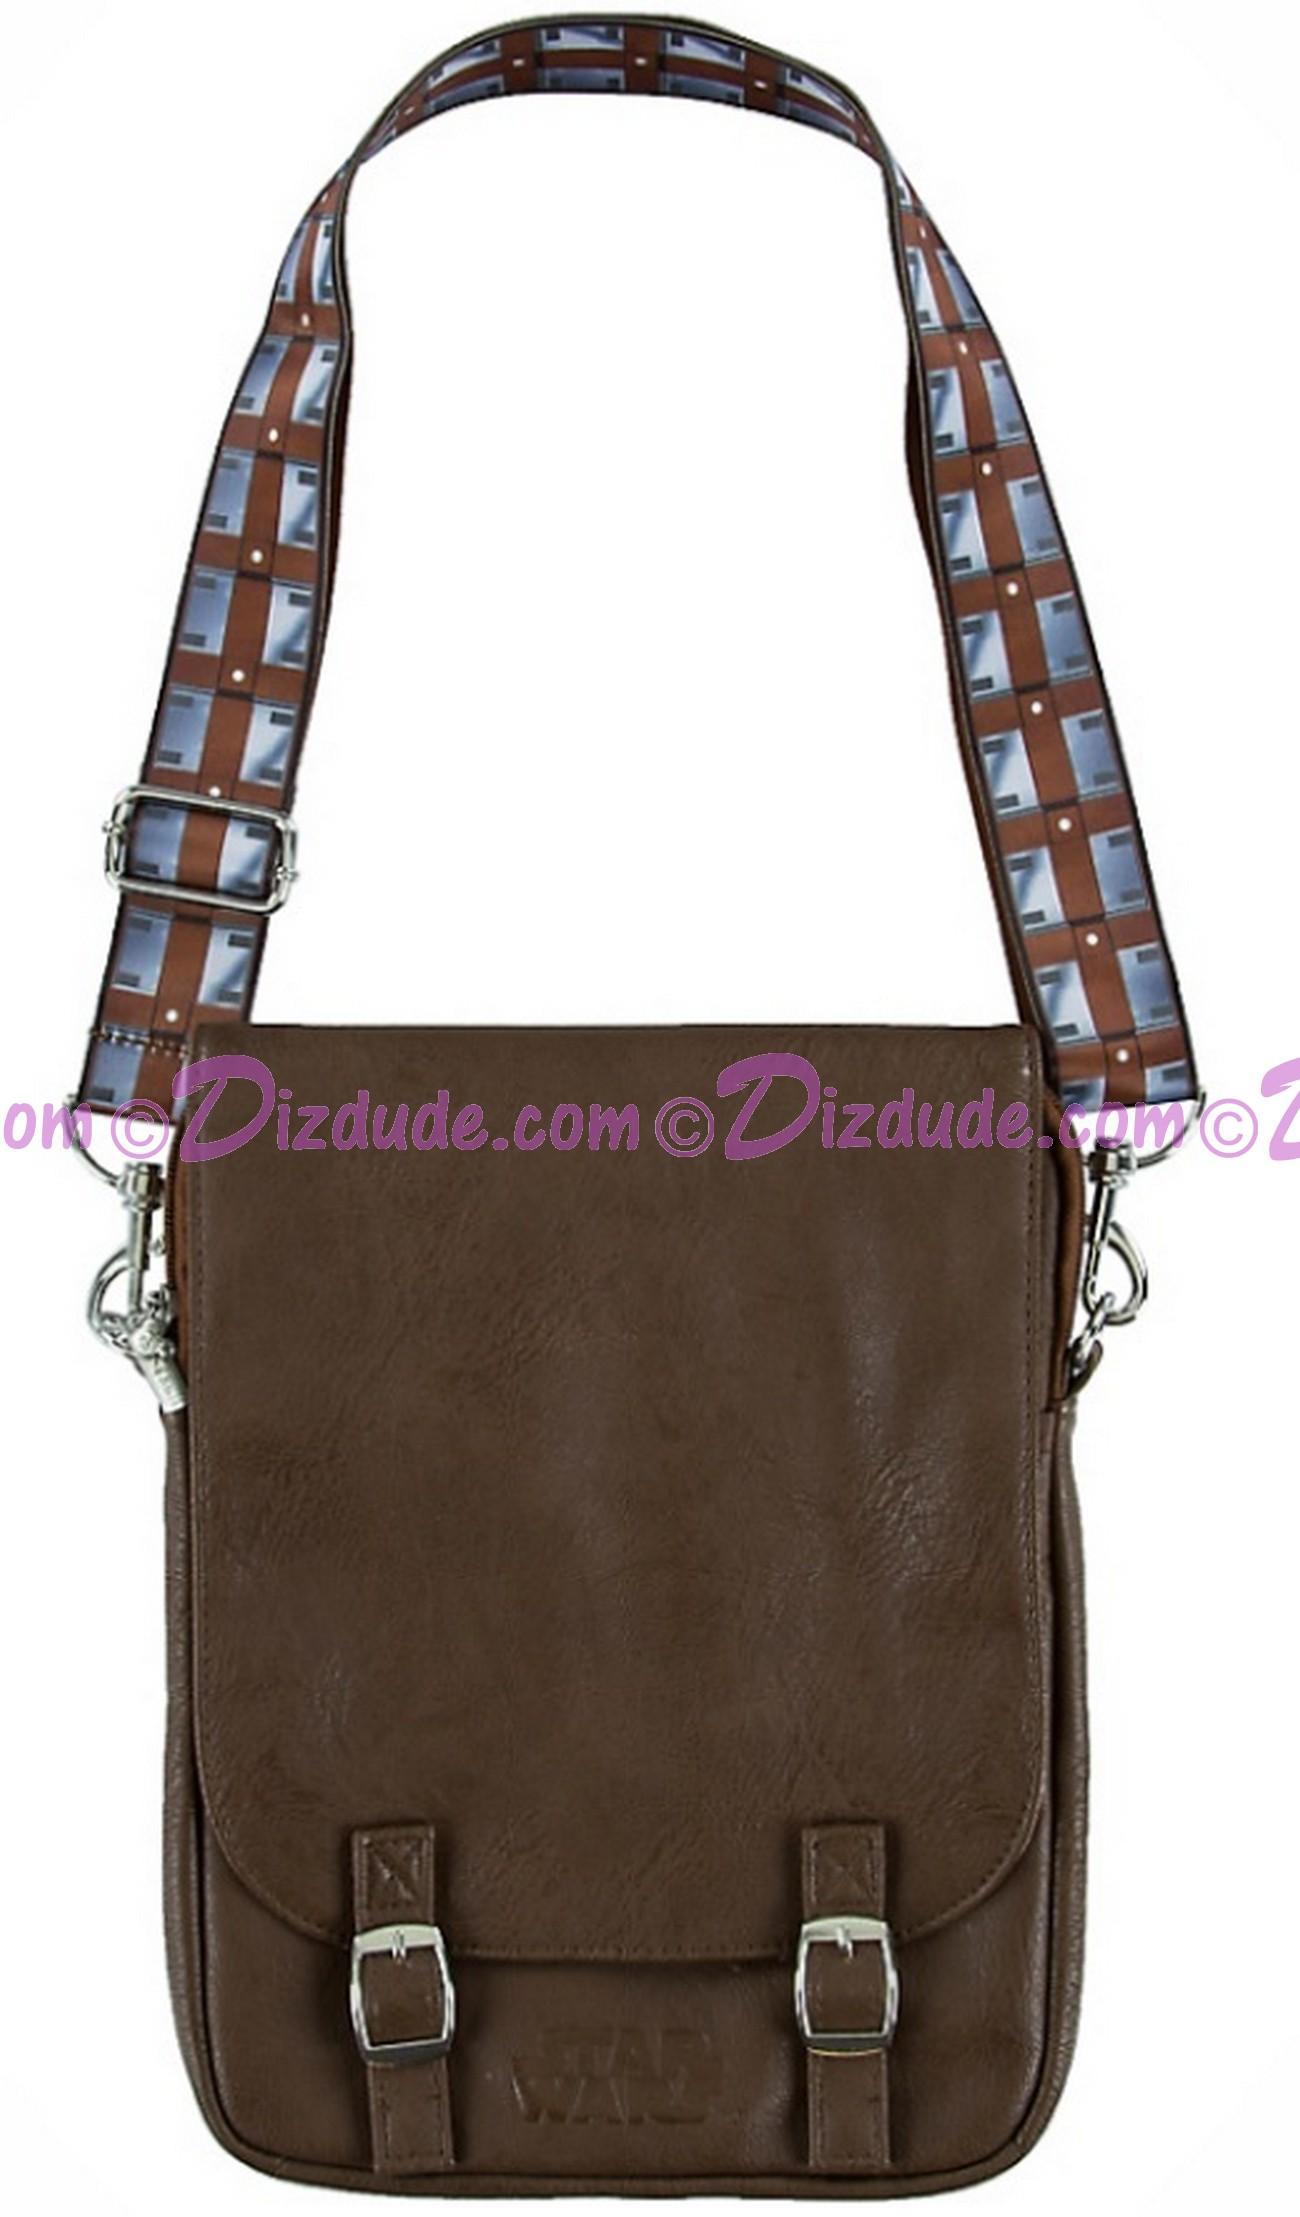 Chewbacca Bandolier 10 inch Tablet Case Bag - Disney Star Wars © Dizdude.com